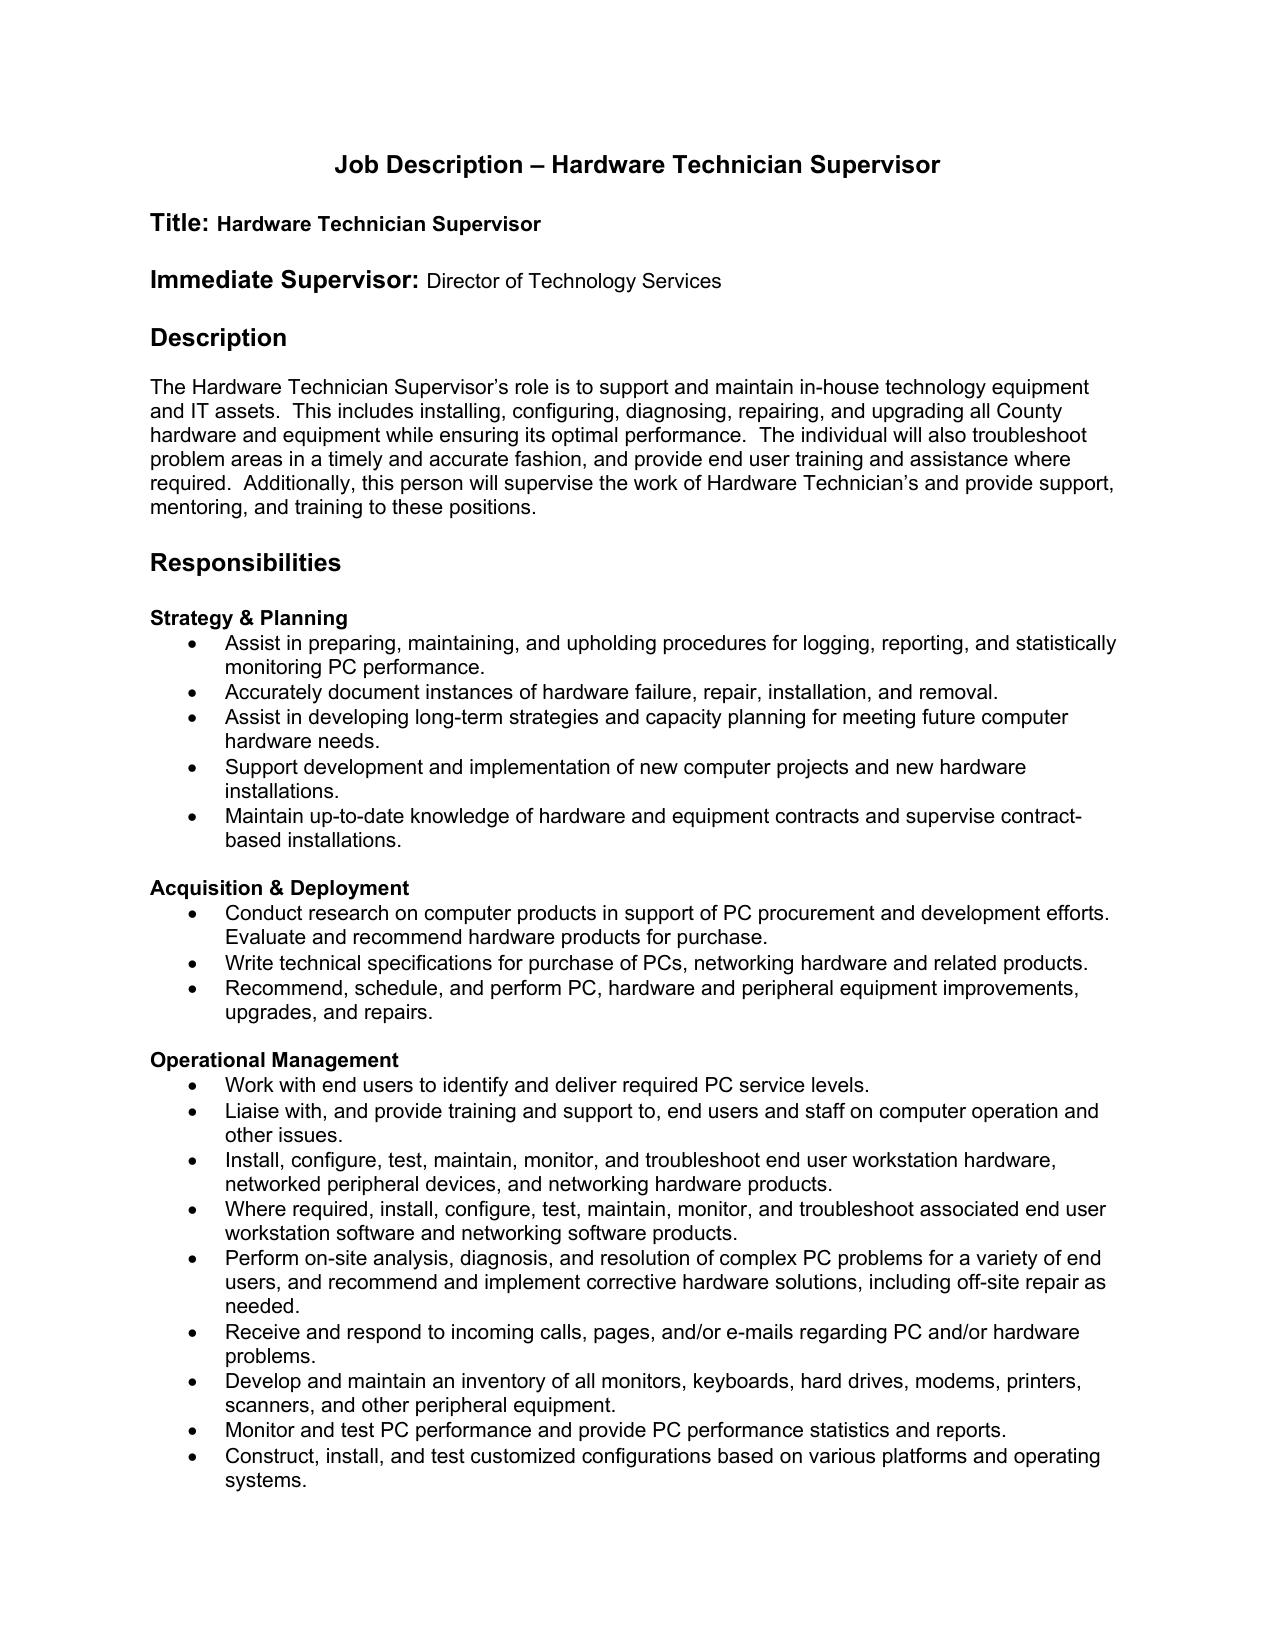 avionics technician job description technology australia essay 1 avionics technician job description - Assembly Technician Job Description